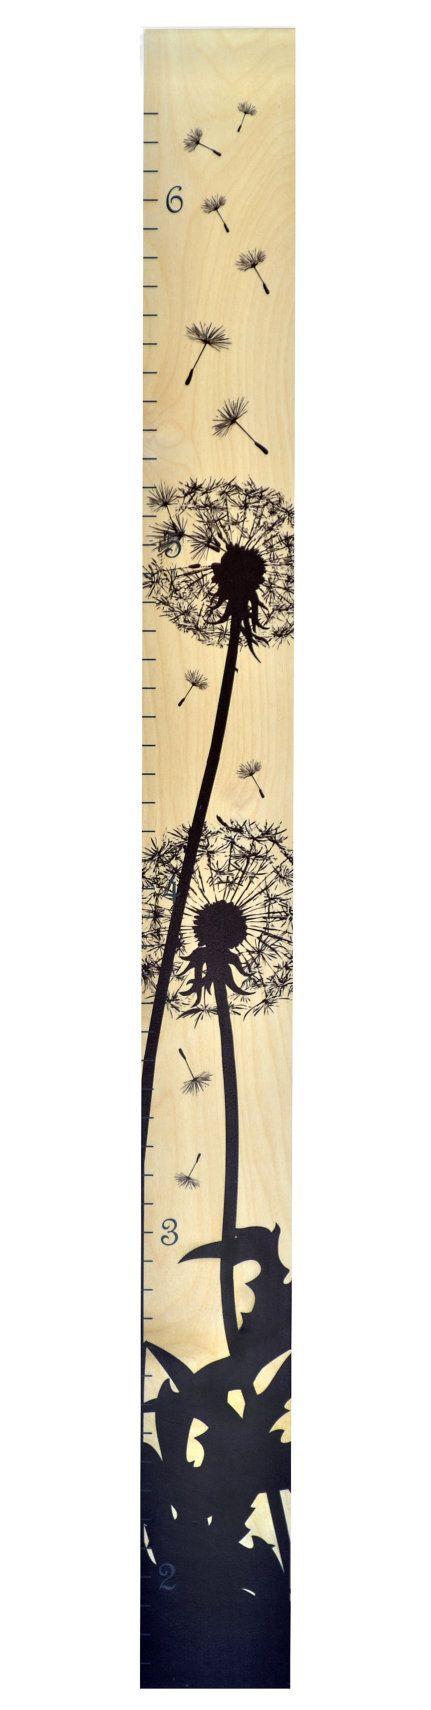 Dandelion Silhouette Modern Wooden Ruler Growth by GrowthChartArt, $70.00